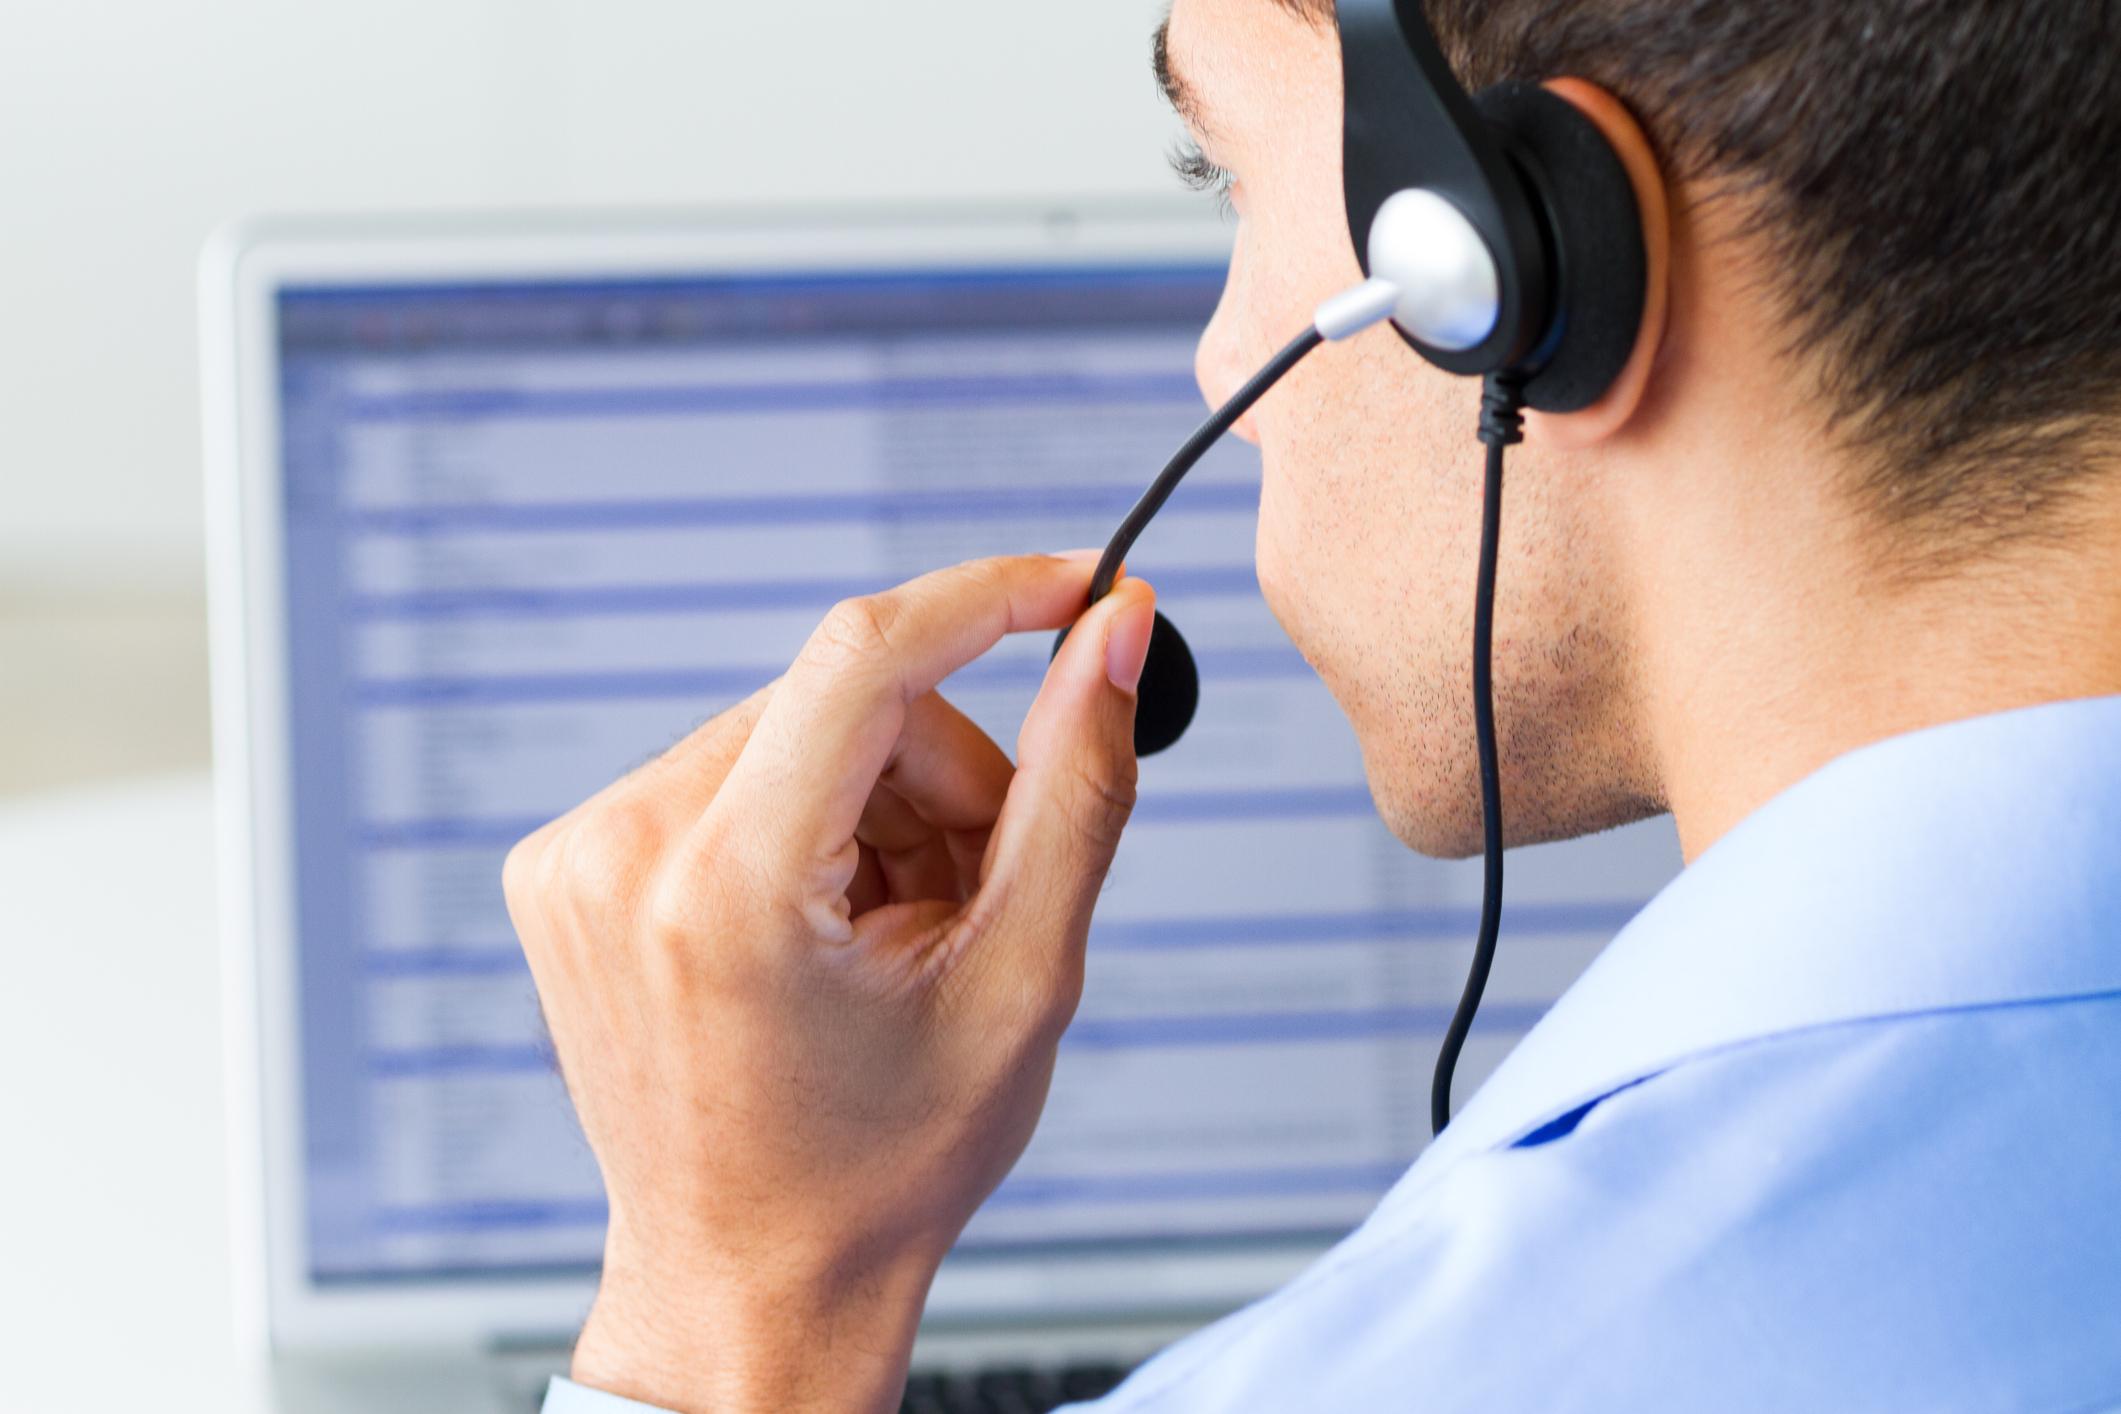 A customer service representative speaking to someone via a headset.